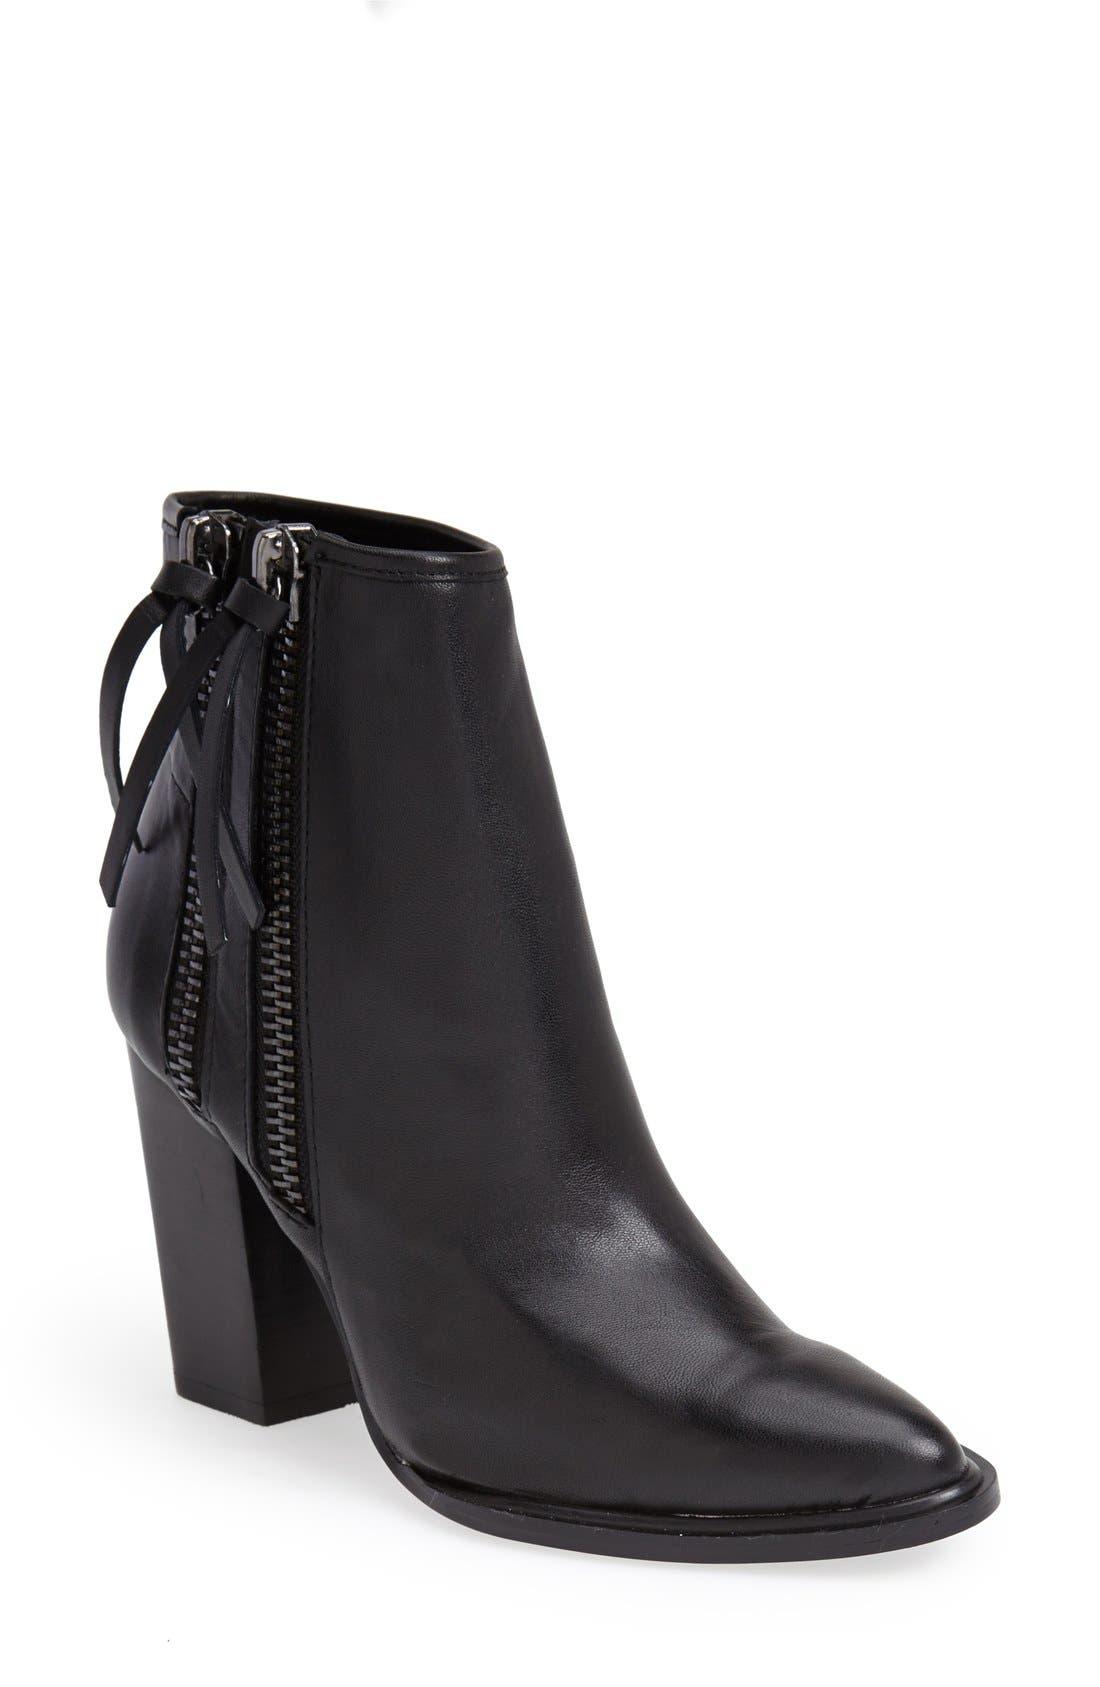 Alternate Image 1 Selected - Steve Madden 'Marando' Pointy Toe Leather Bootie (Women)